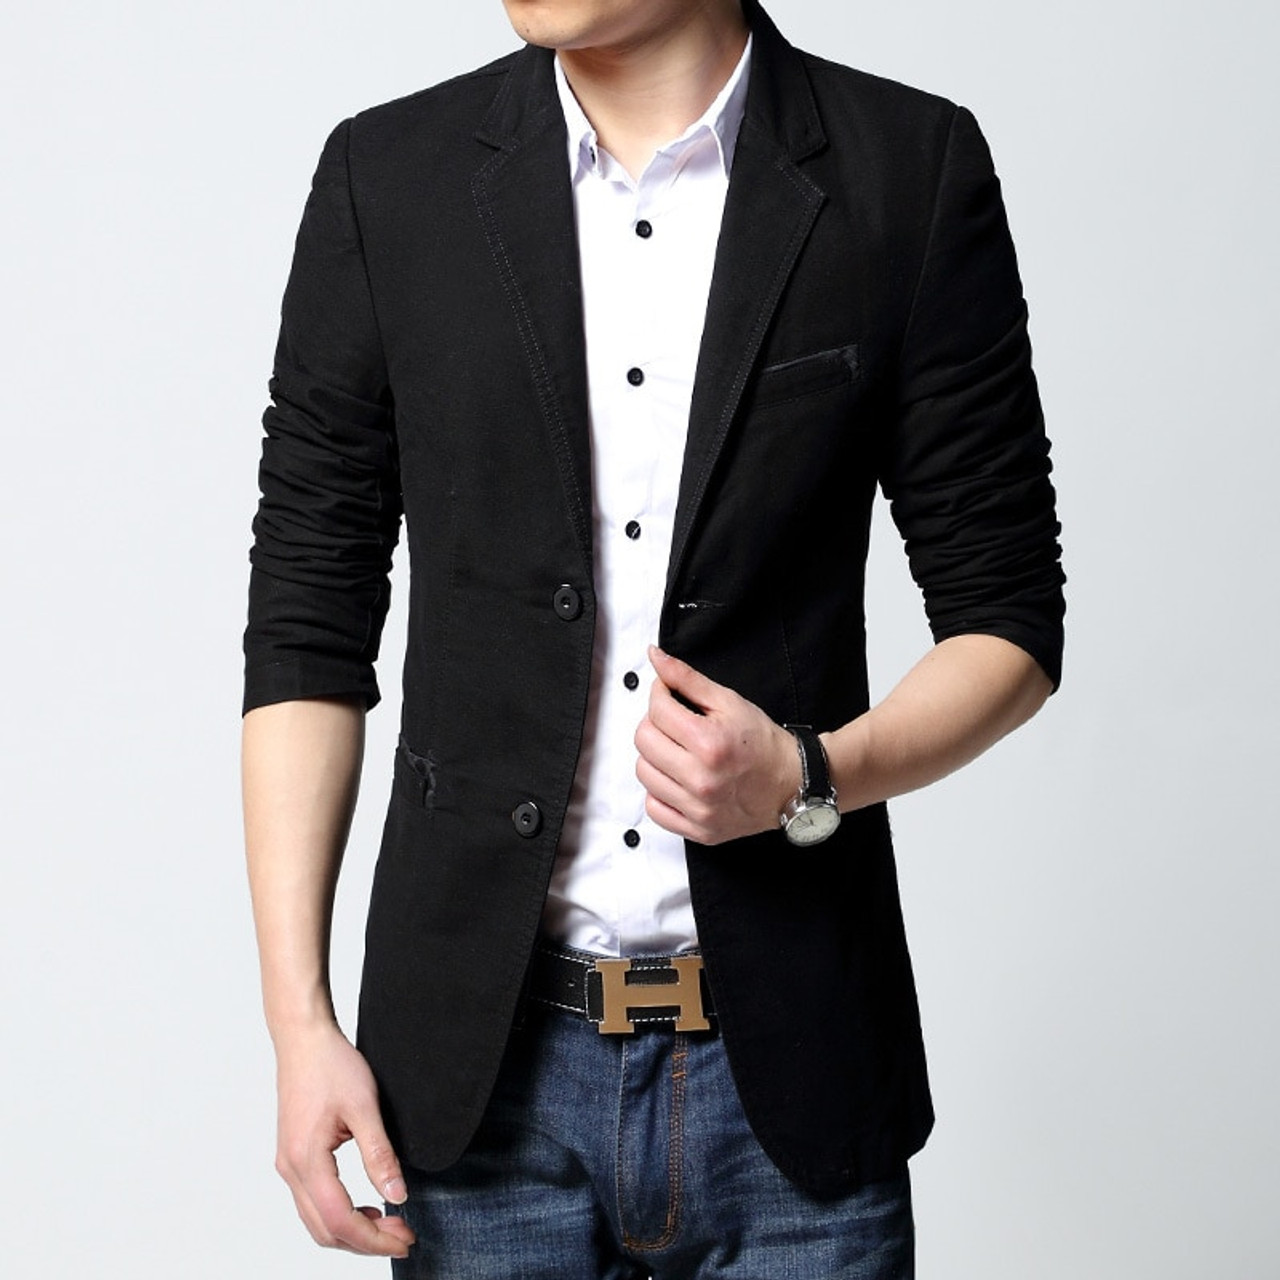 8b4fe4ad5e6 ... 2019 brand casual jacket terno masculino Men's Slim Fit blazer Black  Coat Fashion One button khaki ...